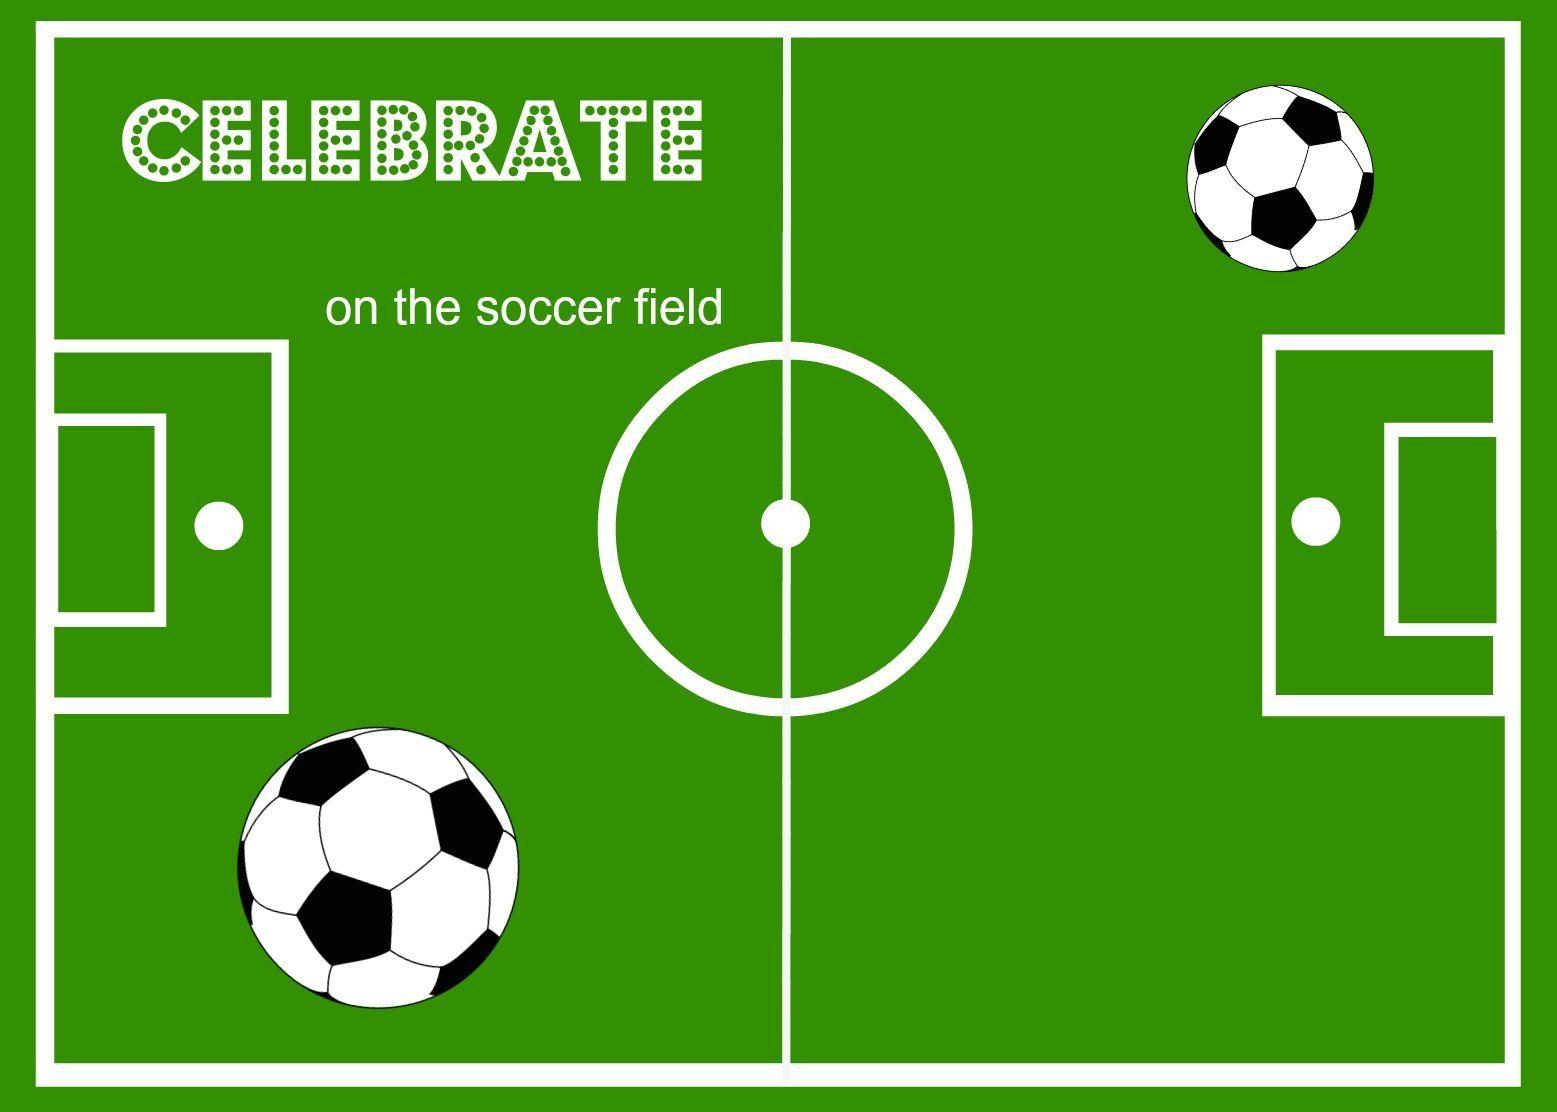 Pin Opeyemi Popoola On Kitans 2nd Birthday Party In 2019 Design 2019 Cards 2000 Soccer Birthday Invitation Soccer Birthday Parties Football Party Invitations